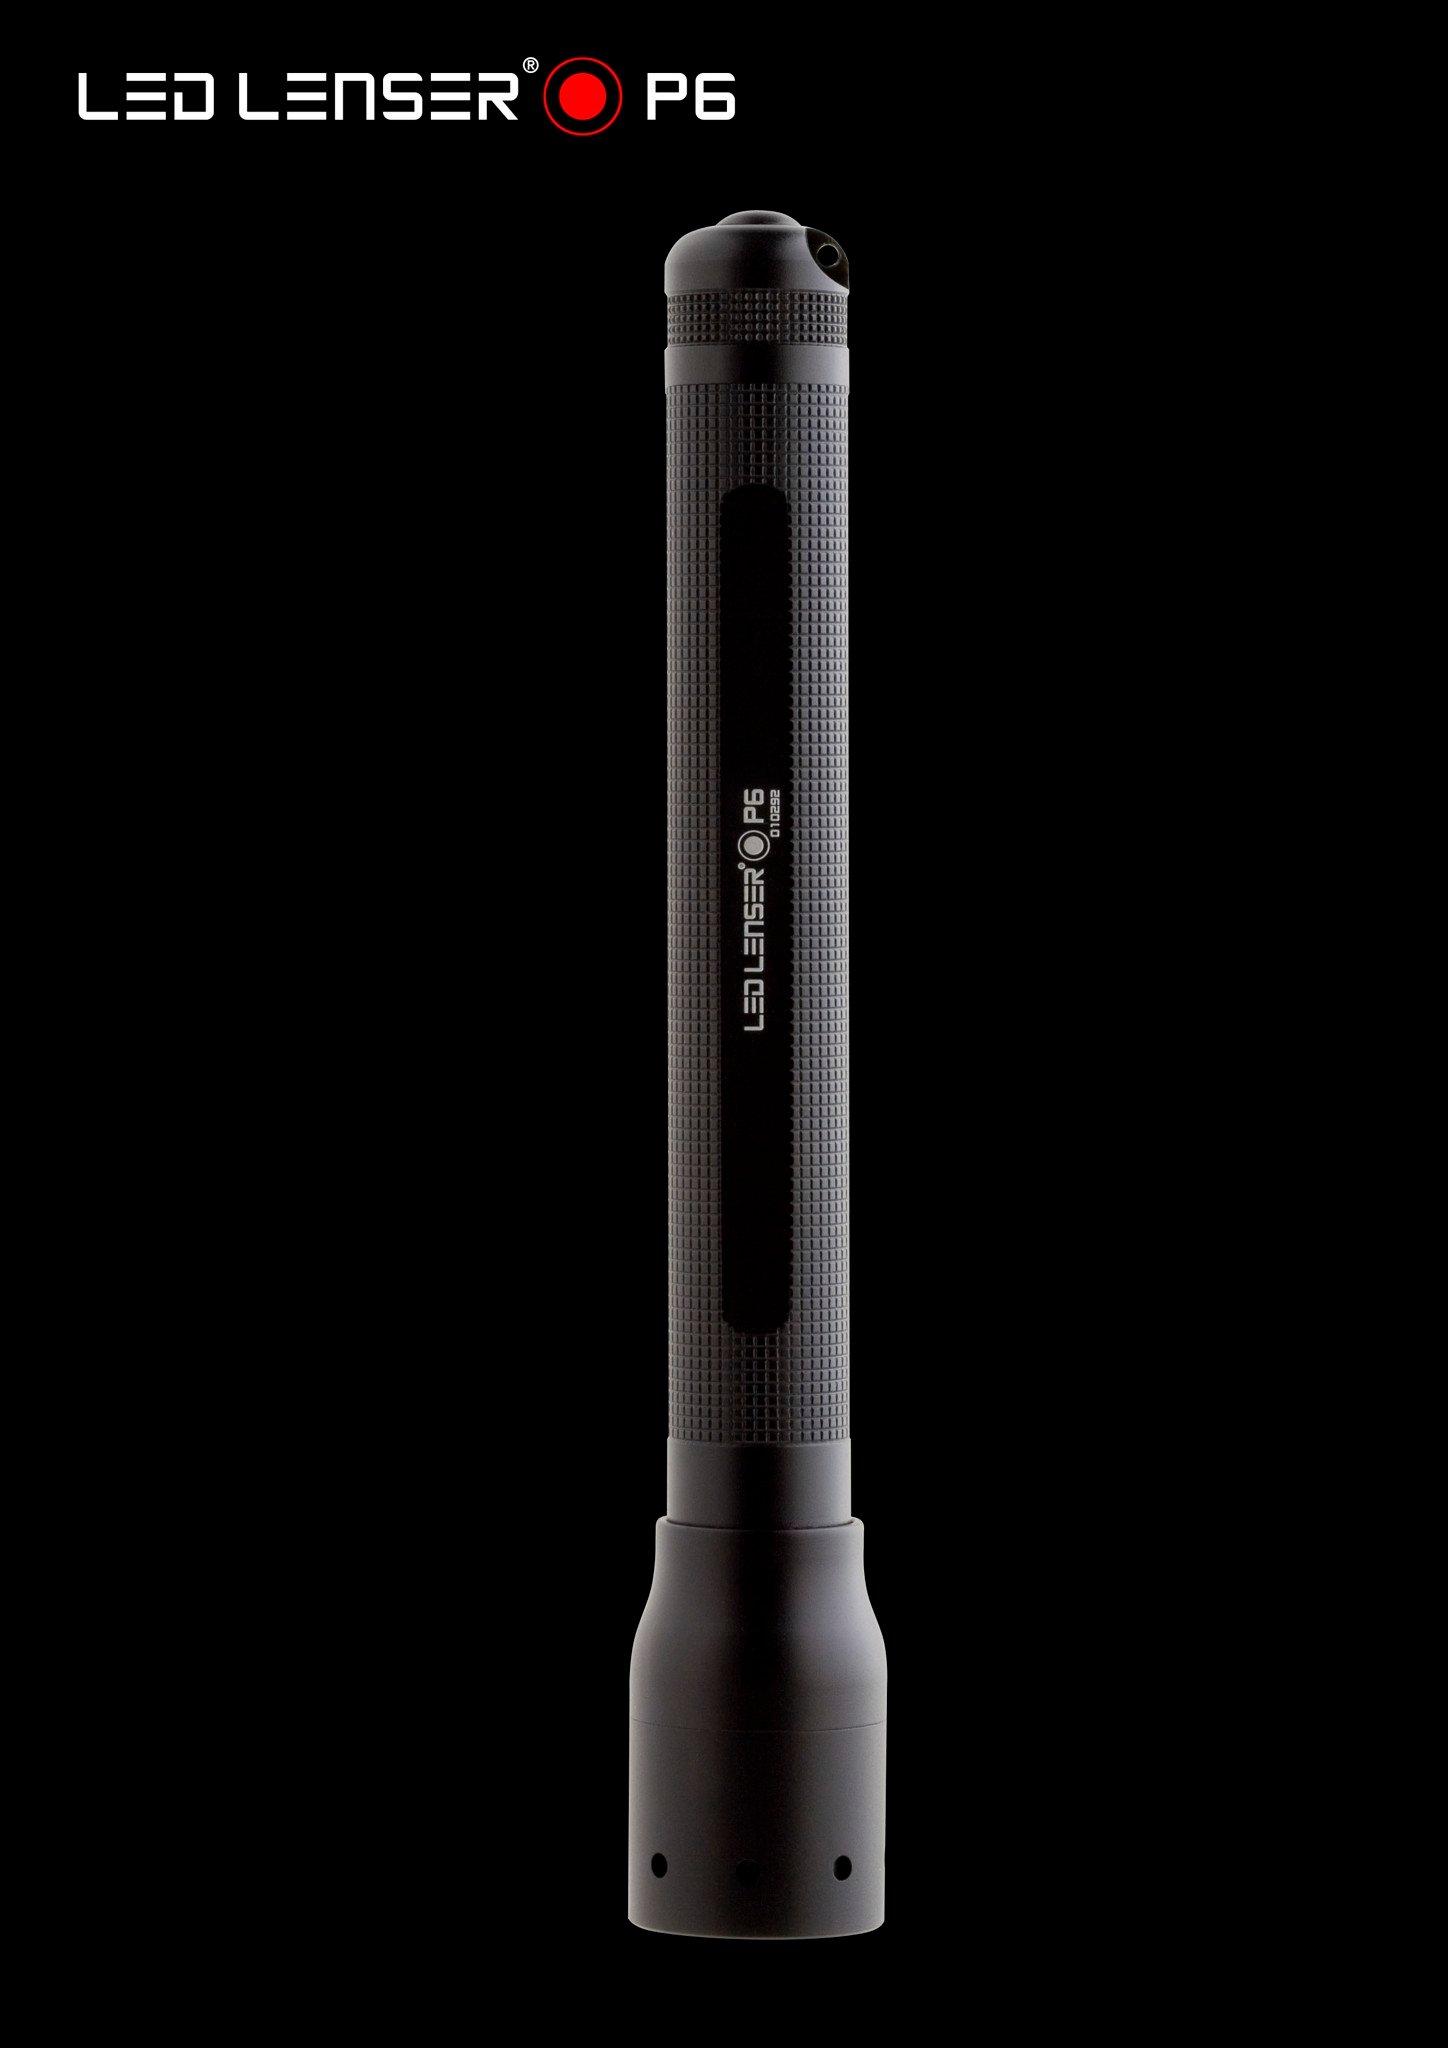 Đèn Pin LEDLENSER P6